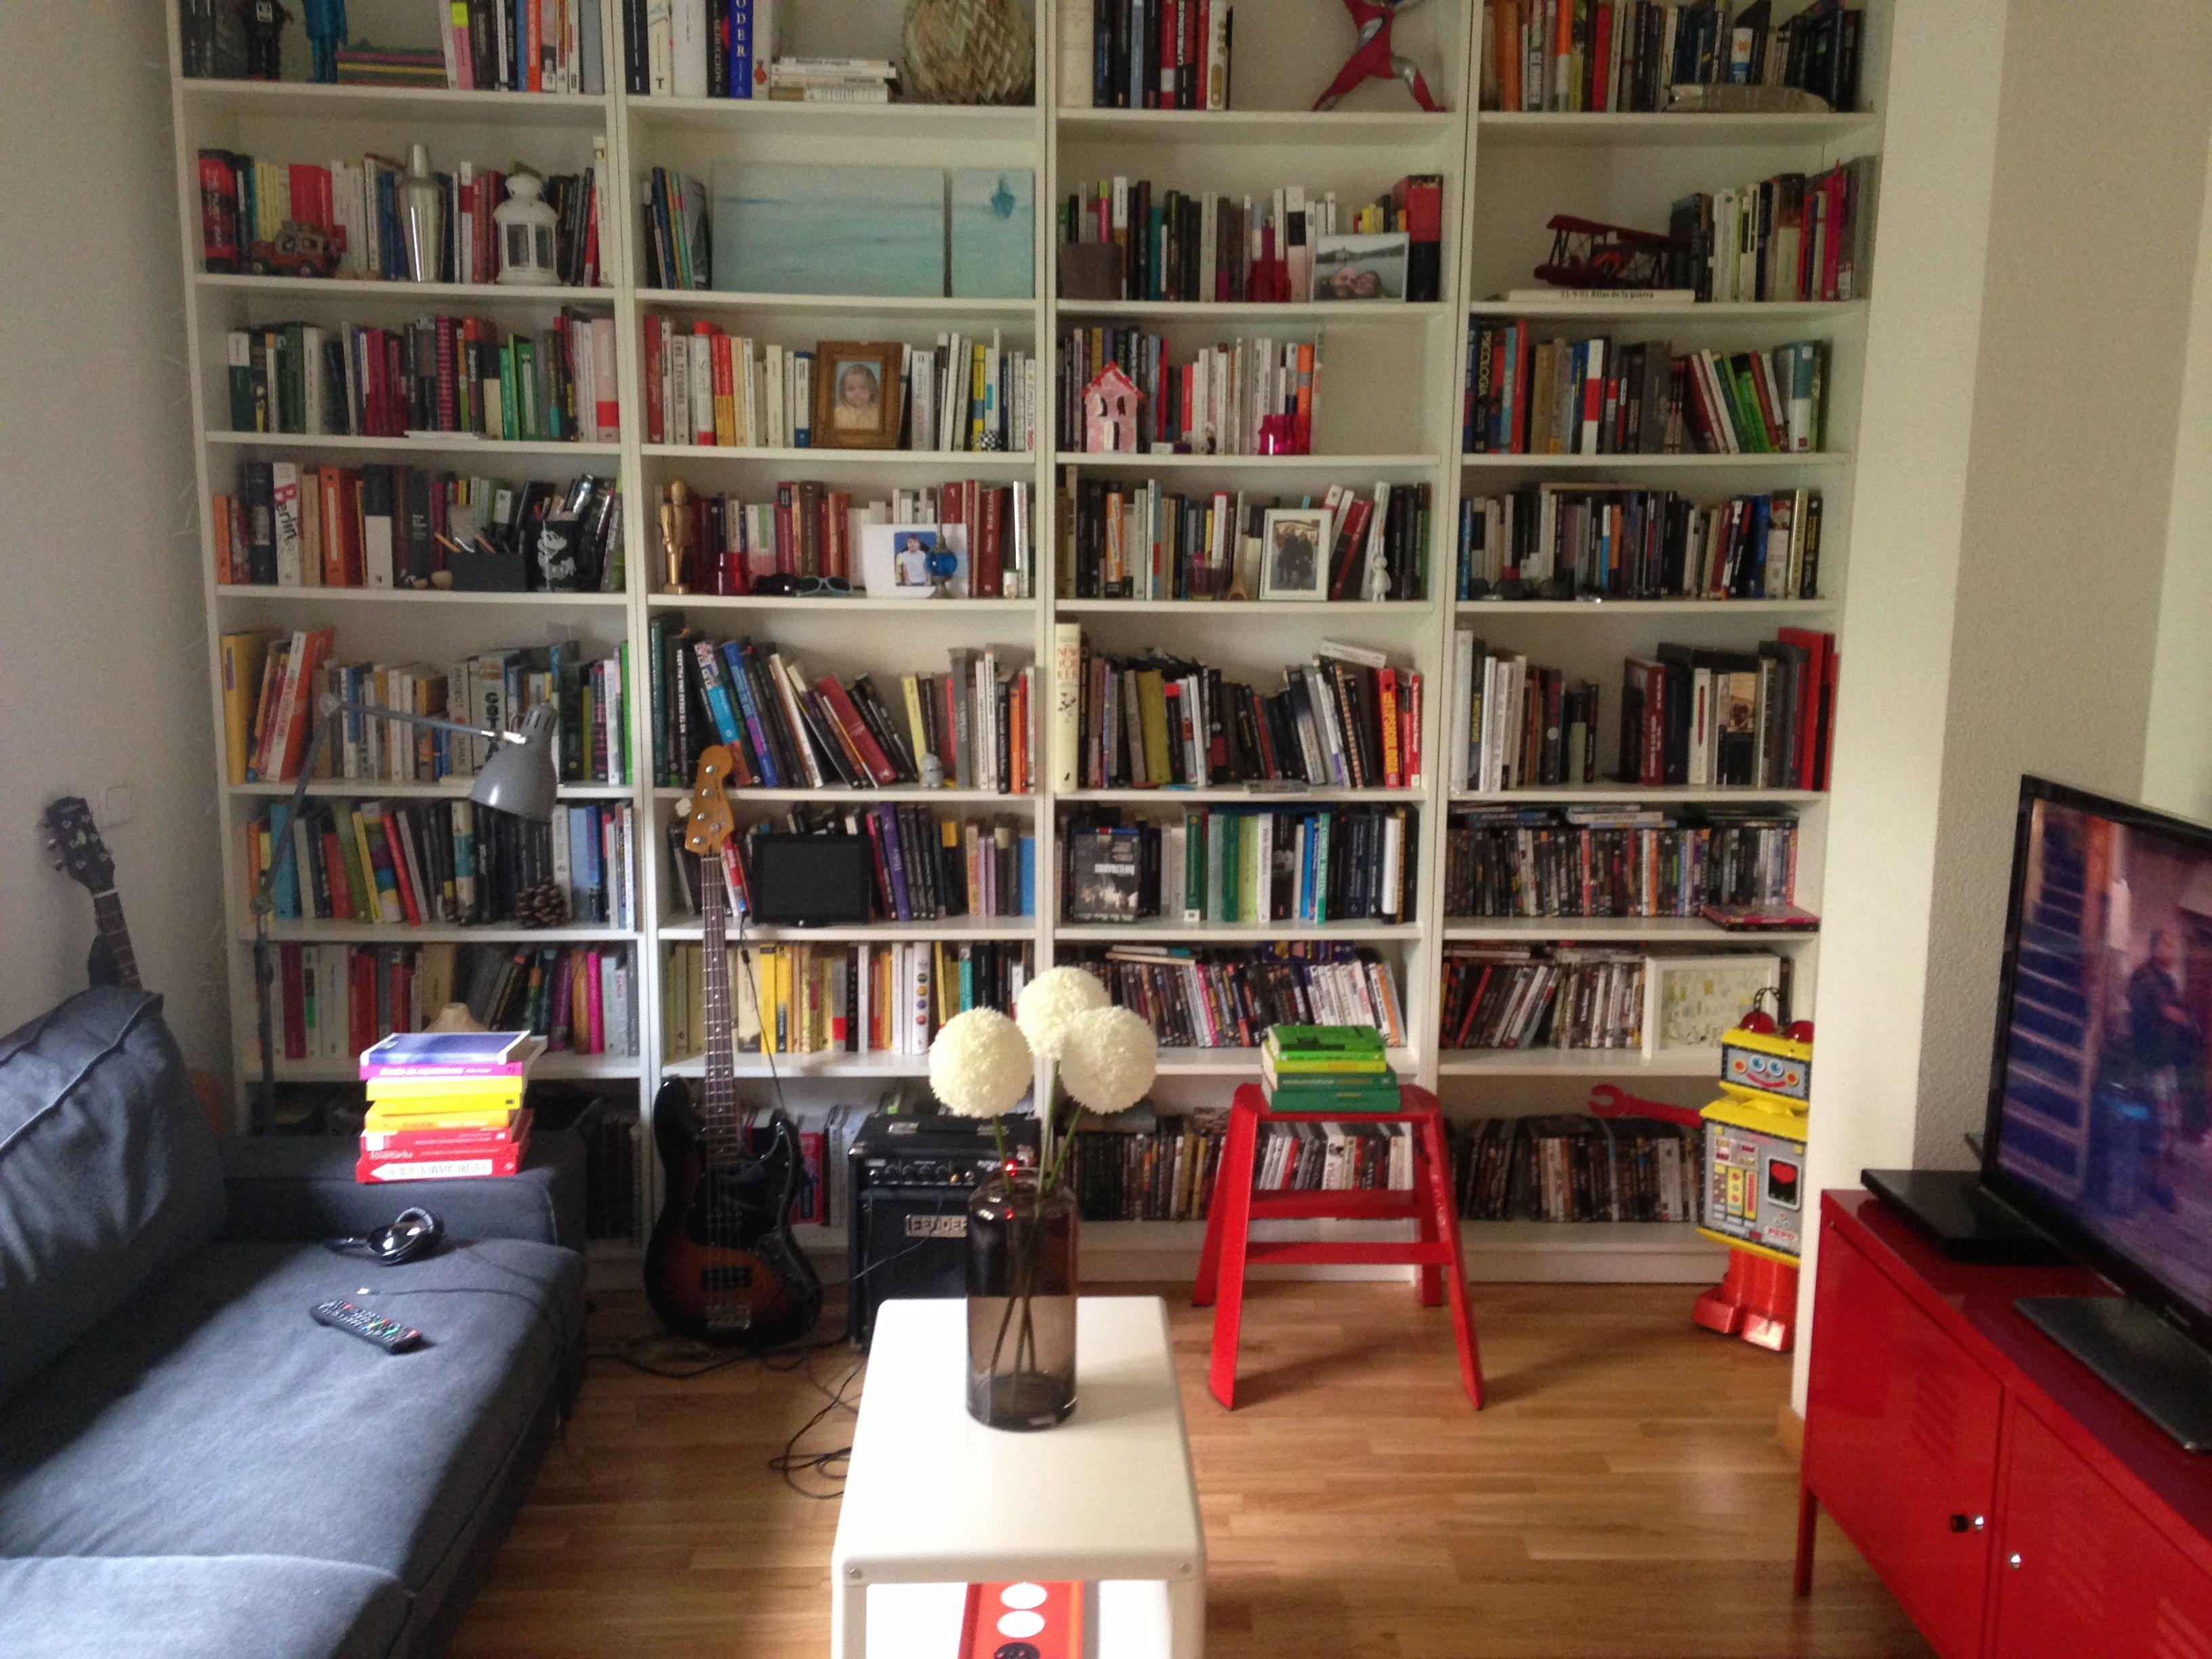 Prob Need Like 2 Full Walls Of This Bookshelves In Living Room Wall Bookshelves Large Bookshelves